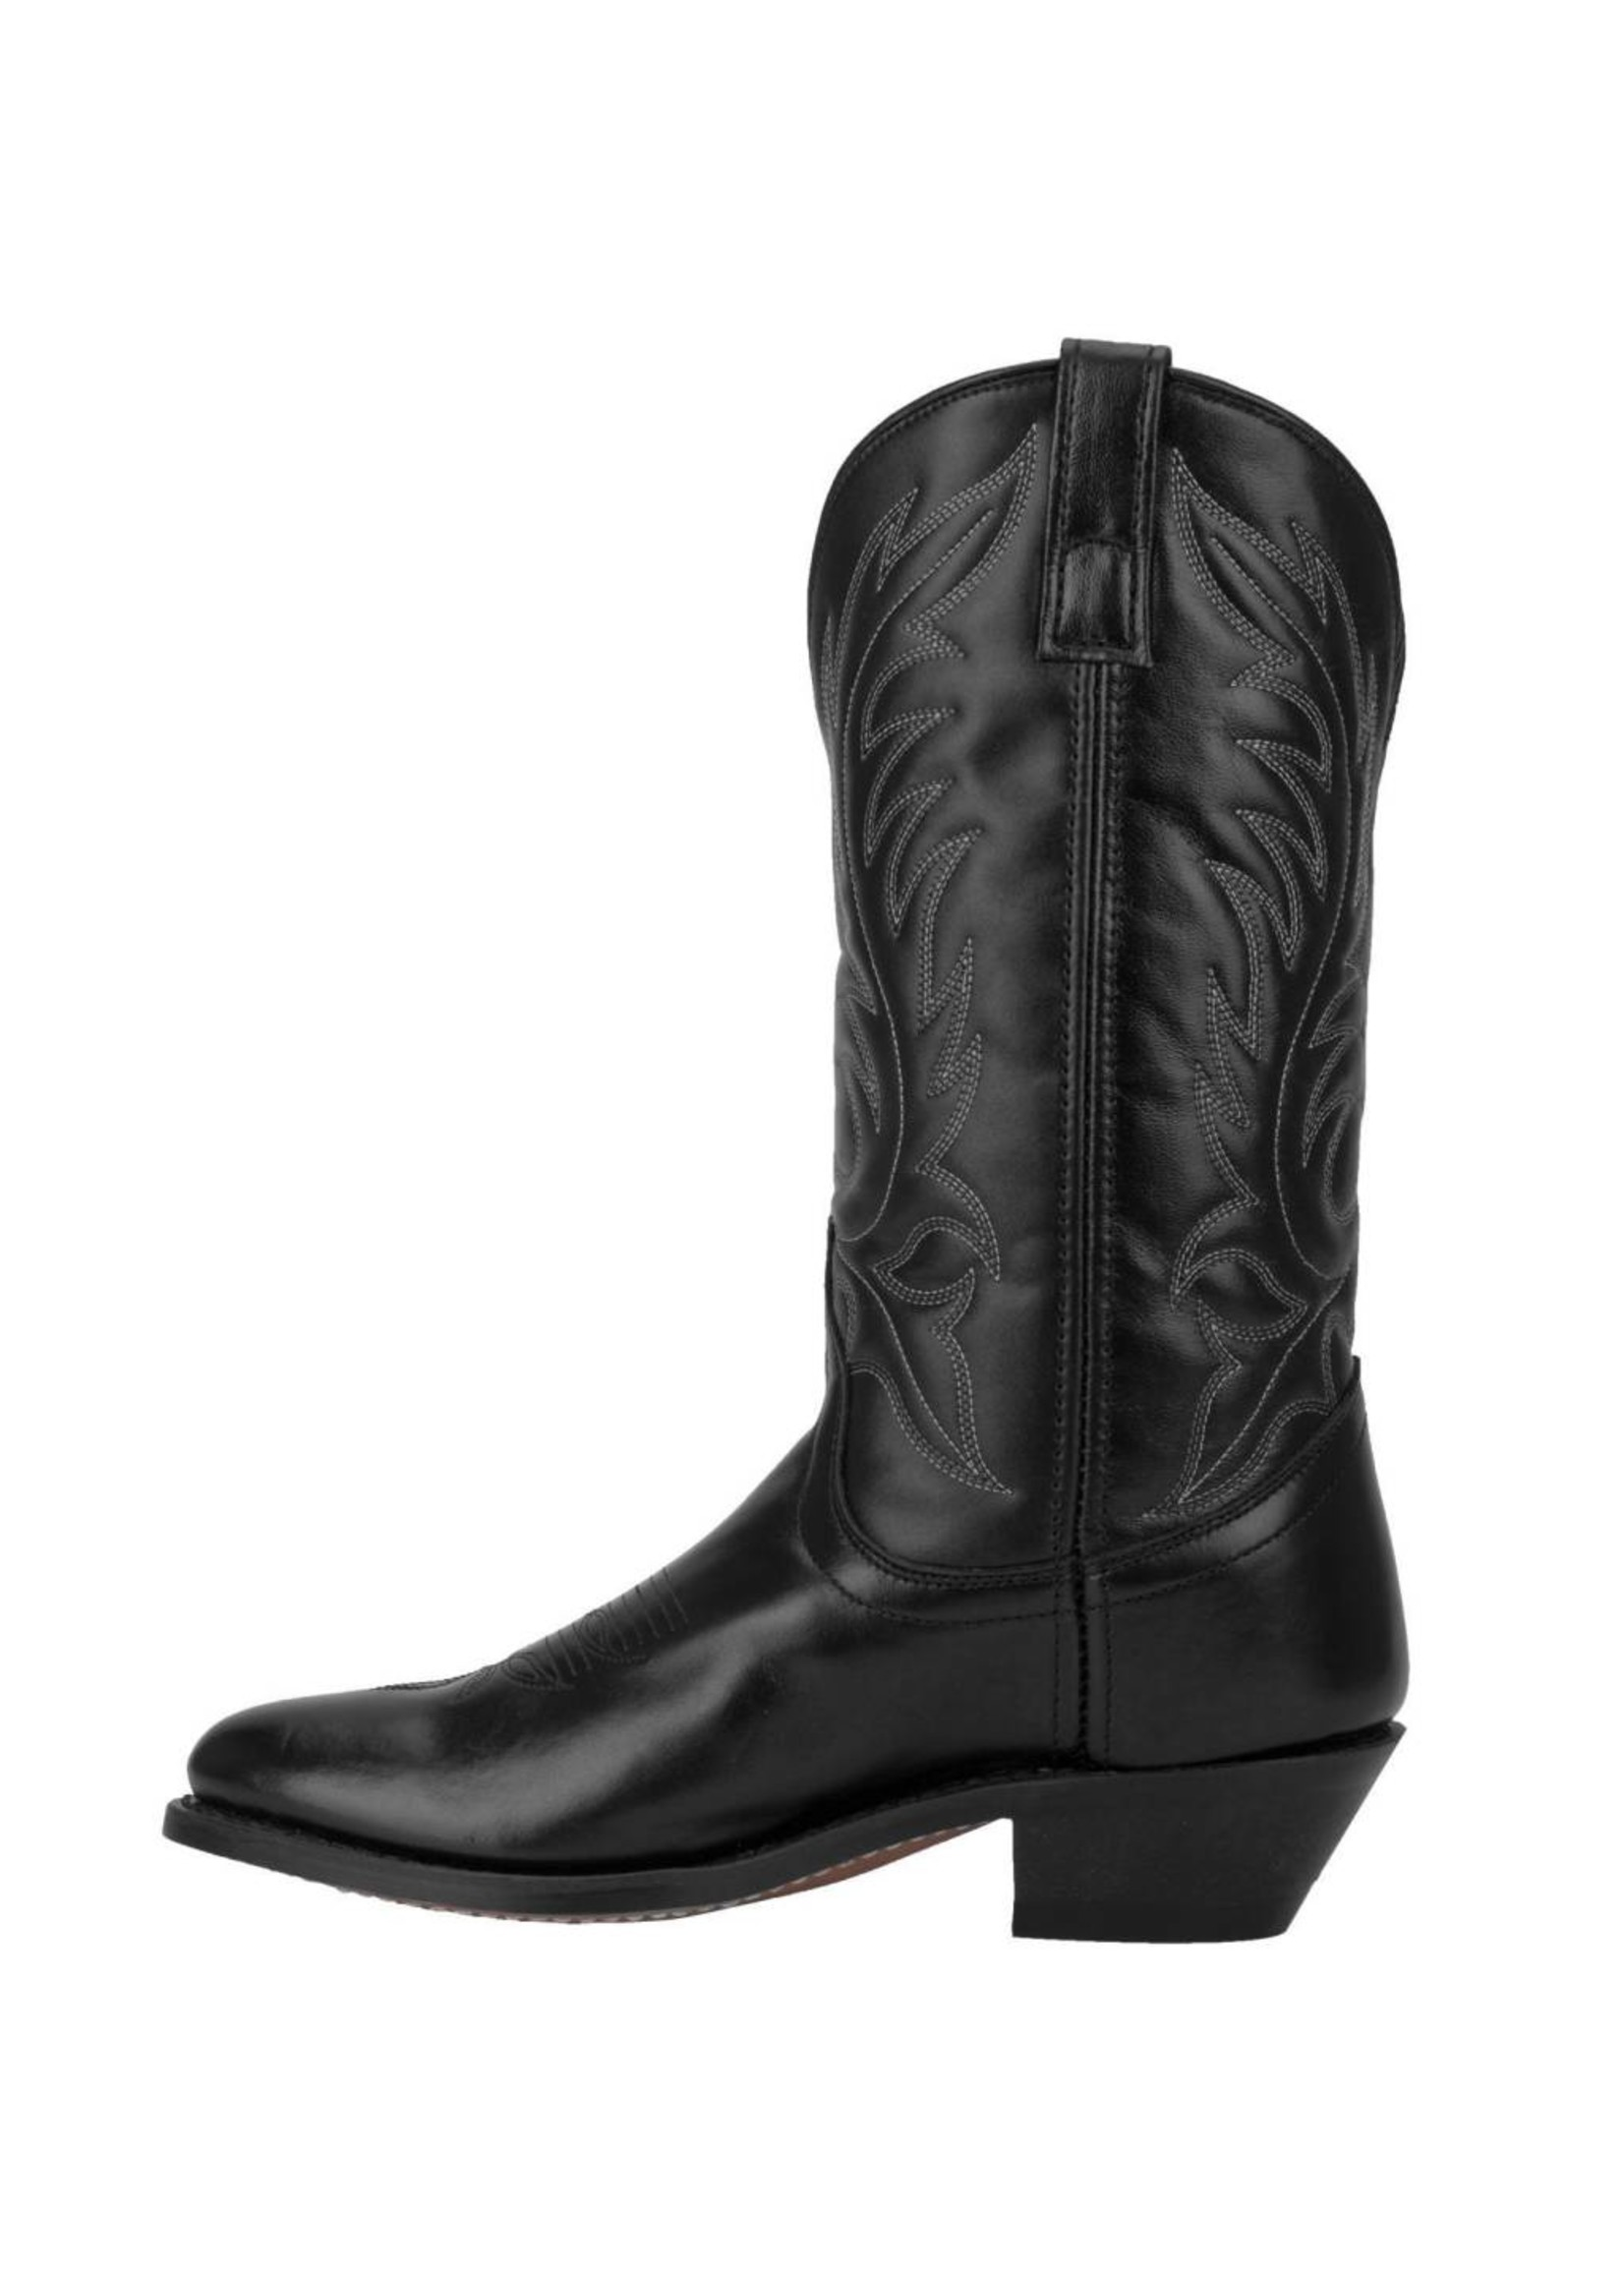 Laredo Women's Kadi Black Leather Foot Western Boots 5740